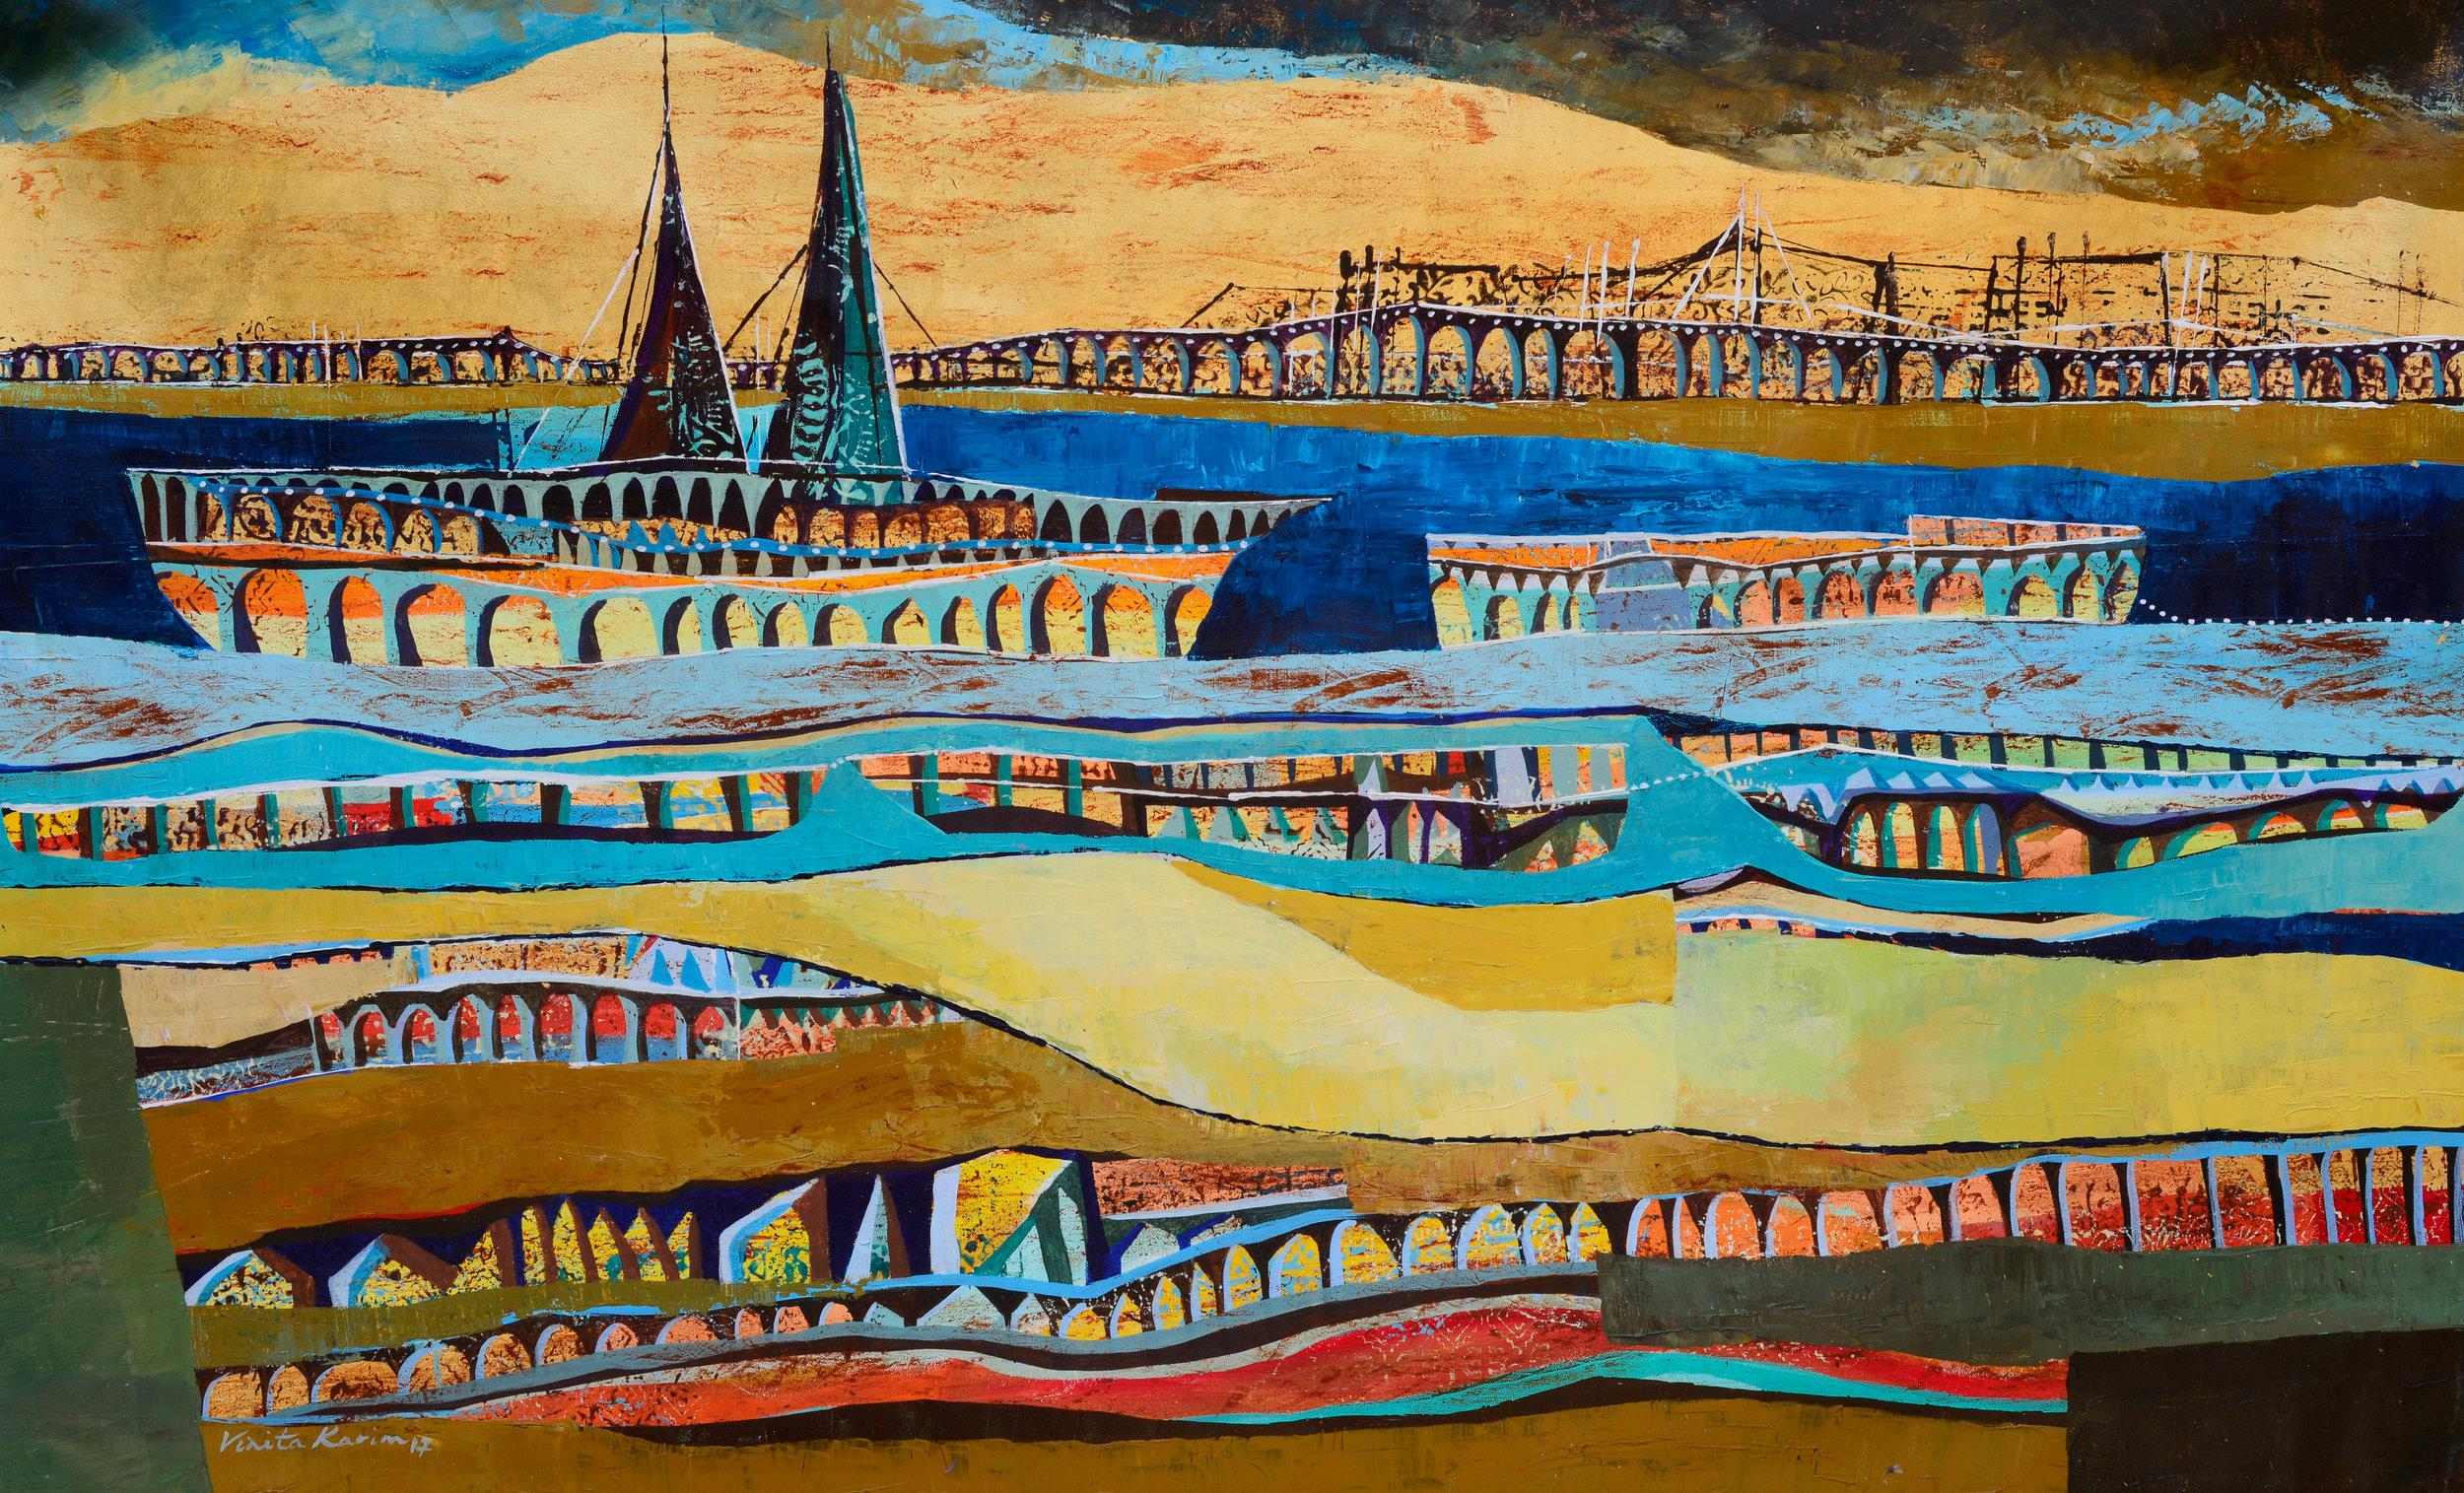 Underworld Wharfs